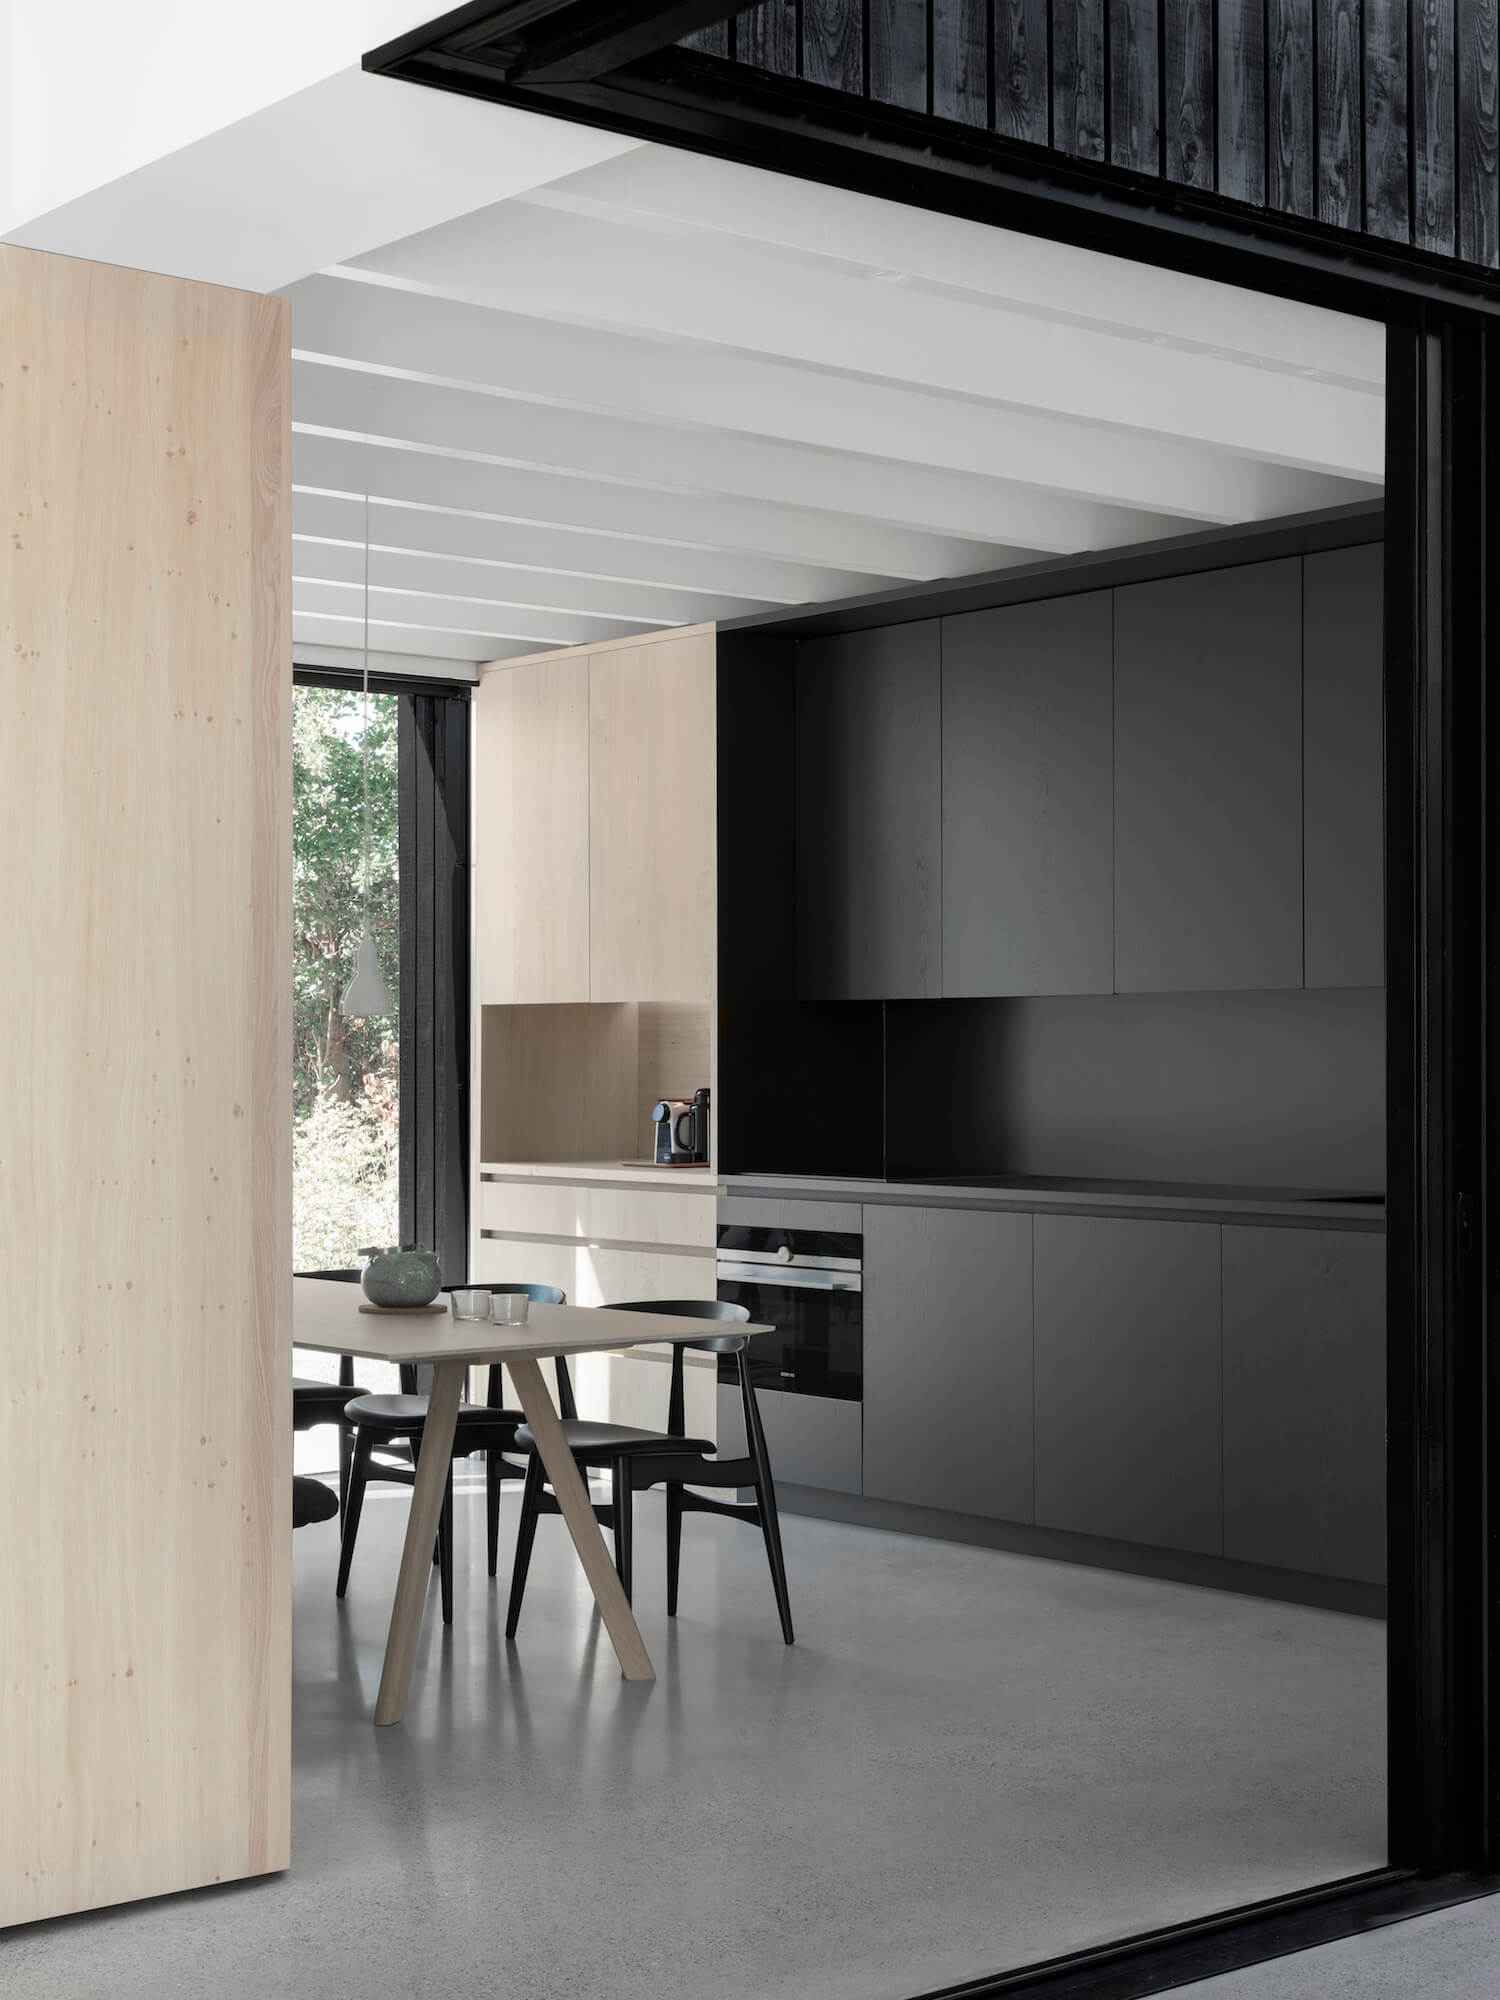 est living tiny holiday home i29 architects 13